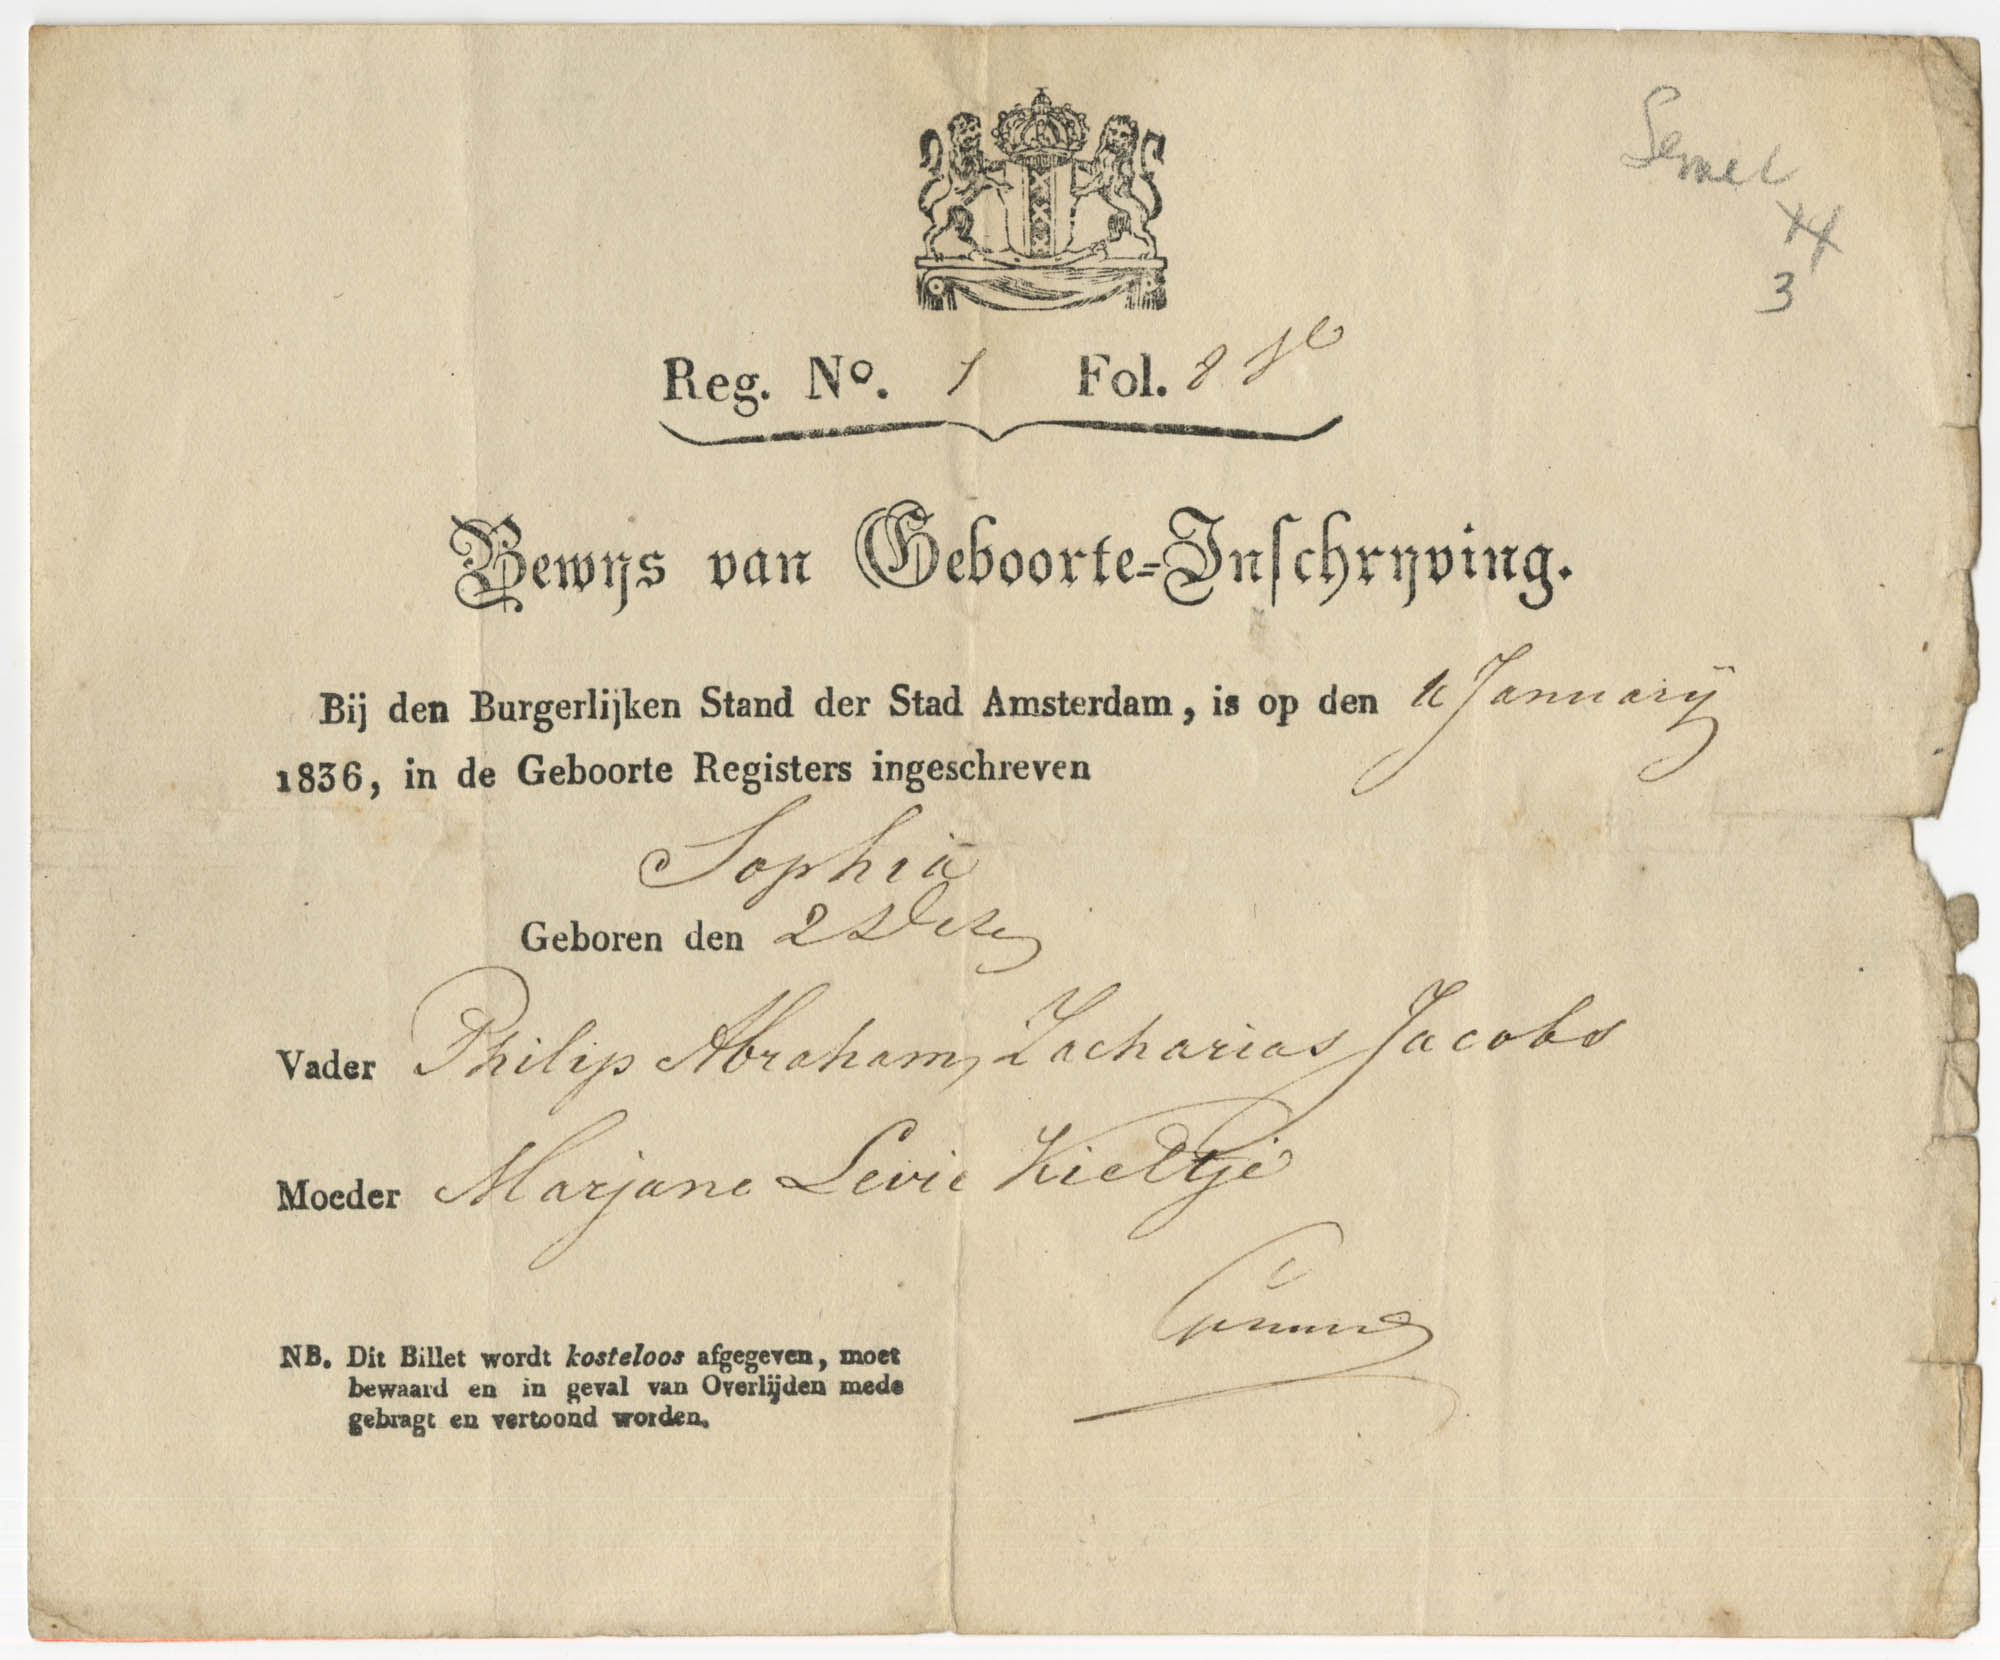 Sophia Jacobs birth certificate, 1836